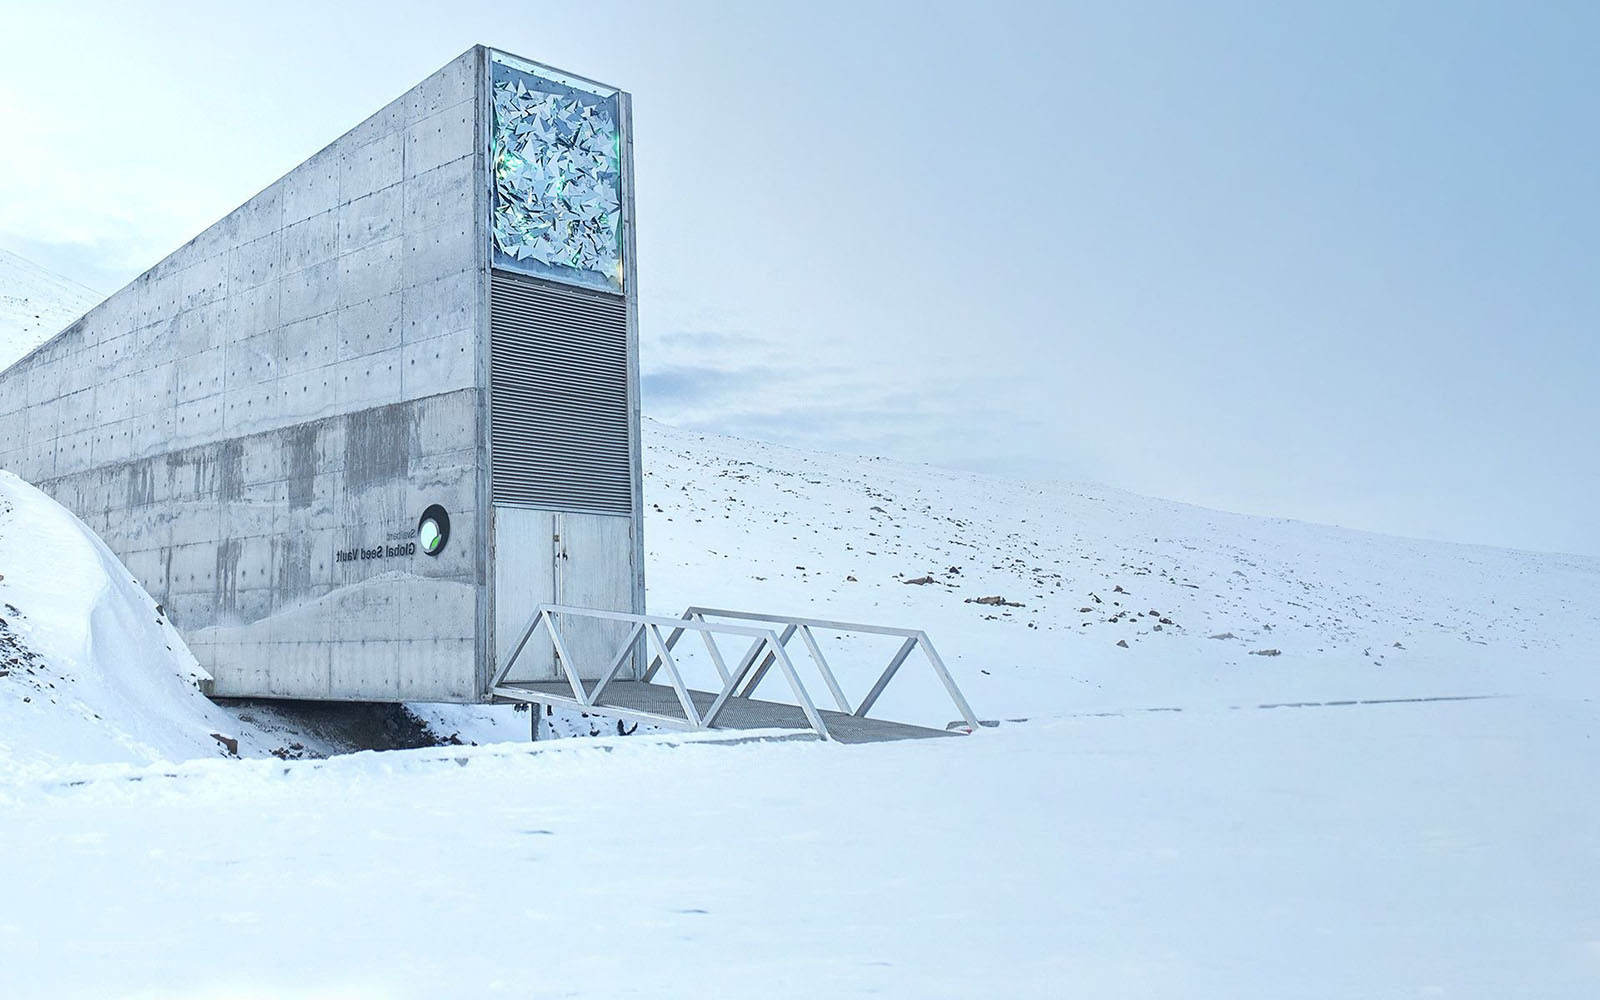 Image of the Svalbard global seed vault